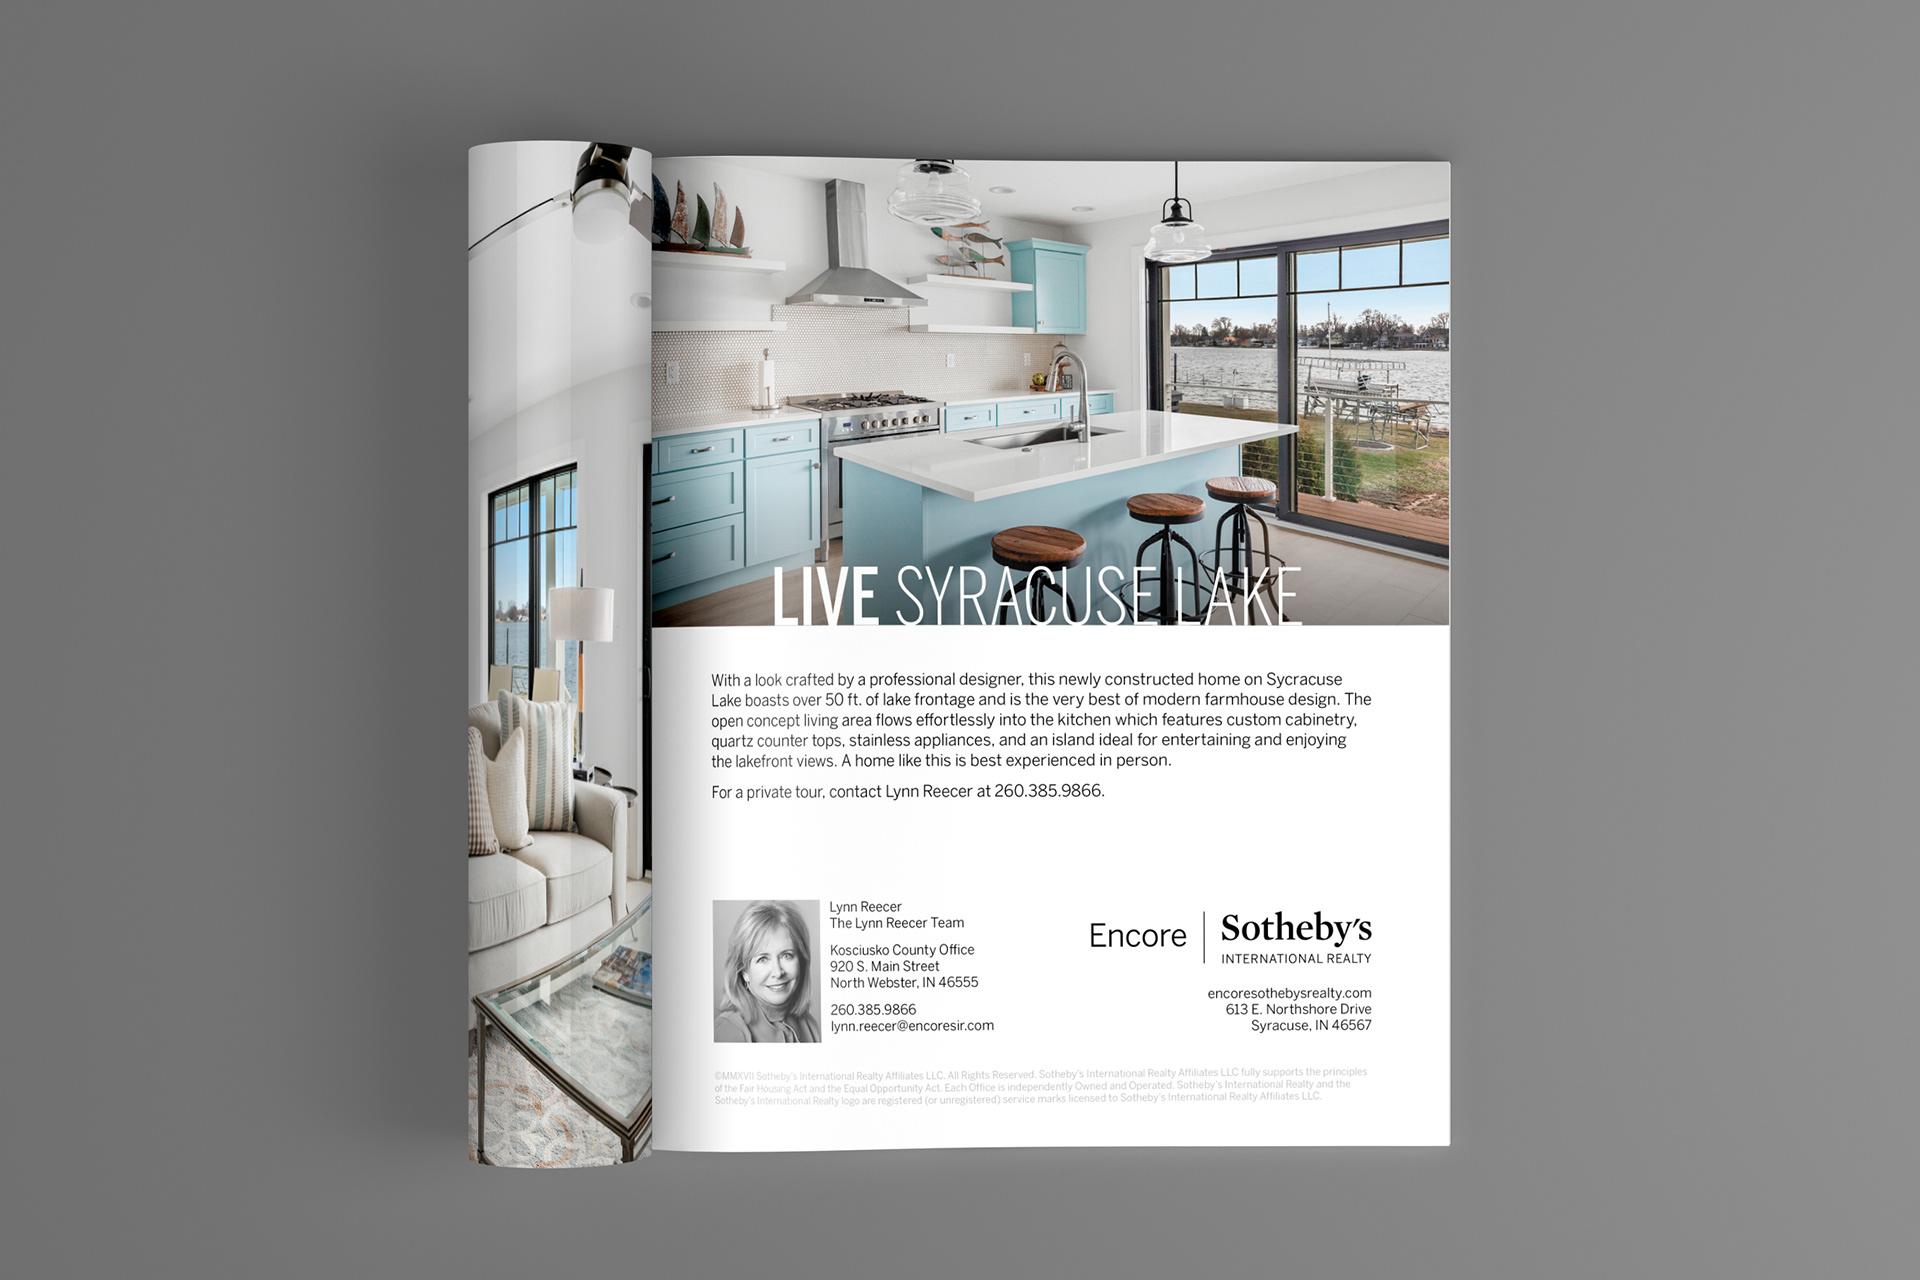 Fort Wayne Magazine - Fort Wayne, Indiana Real Estate Property Photography by Danielle Doepke, real estate photographer located in Fort Wayne Indiana